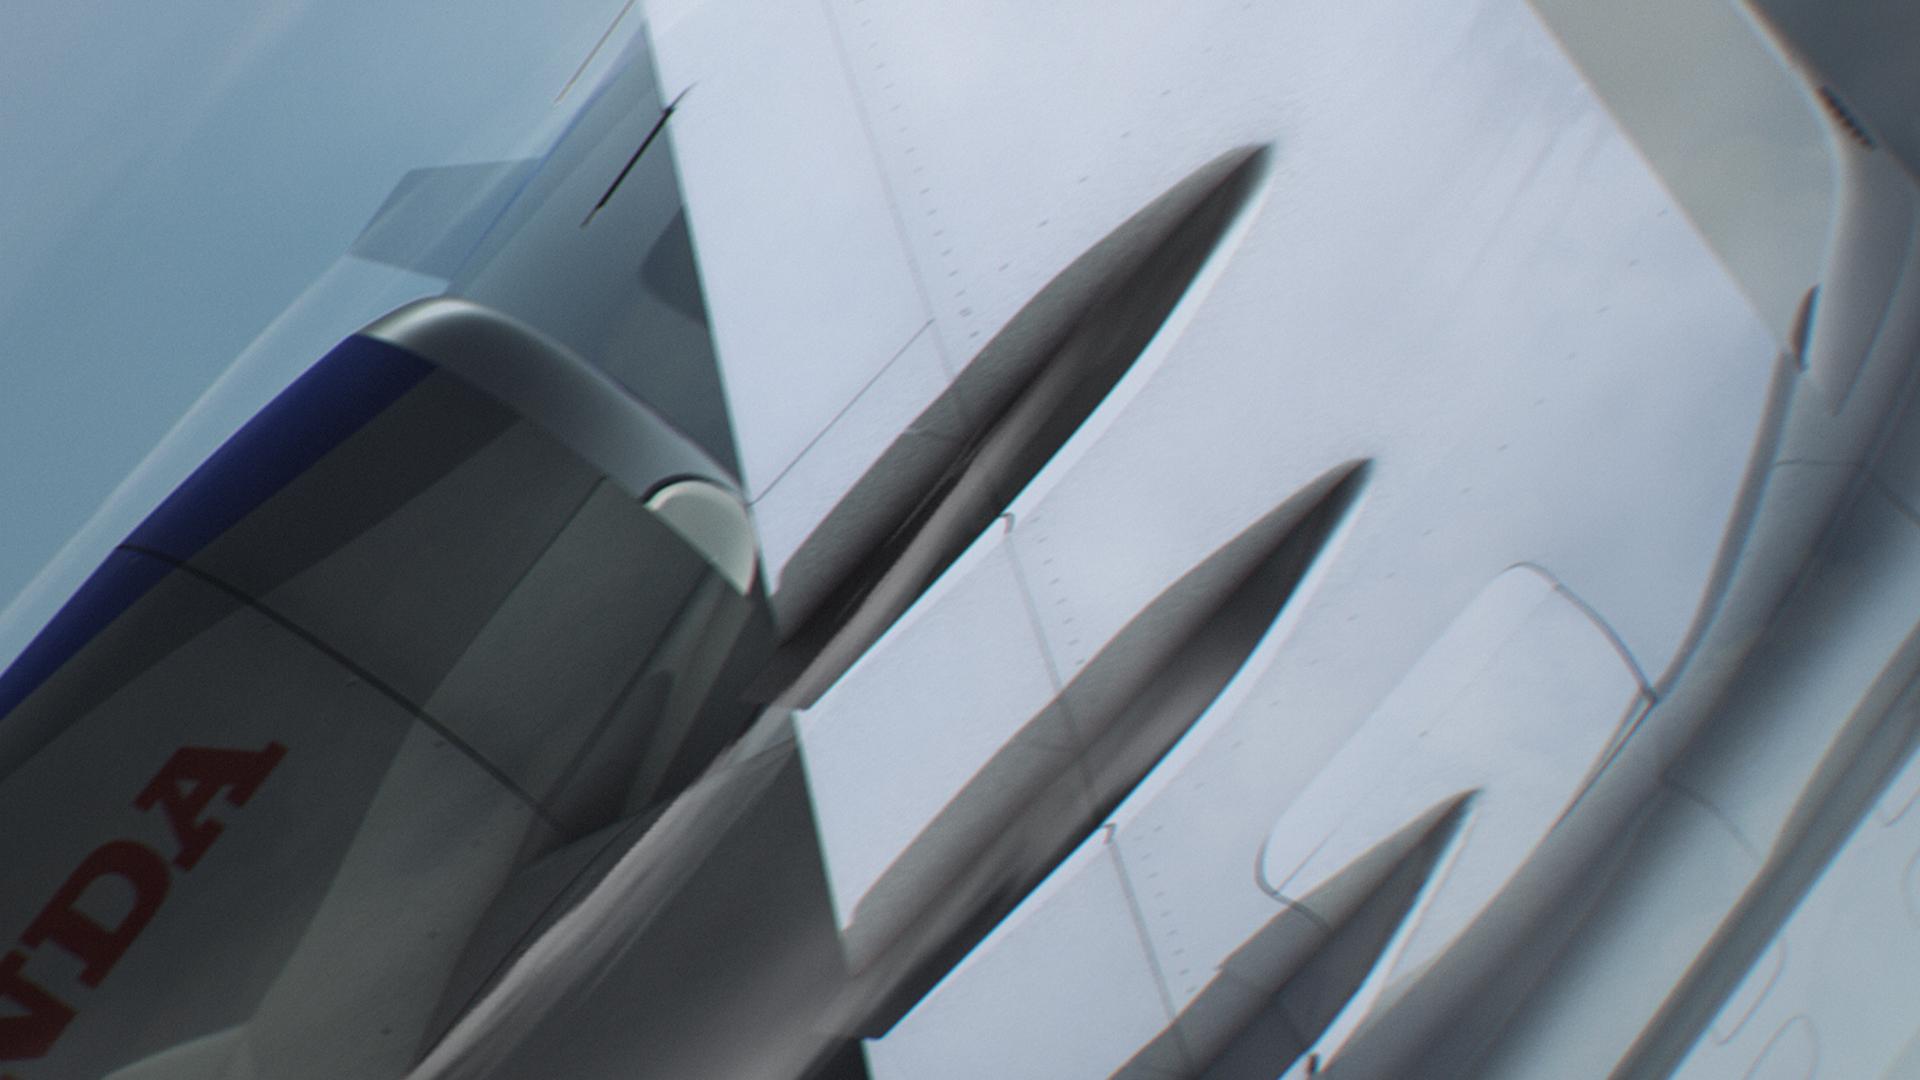 02_Hondajet-JC-1.jpg